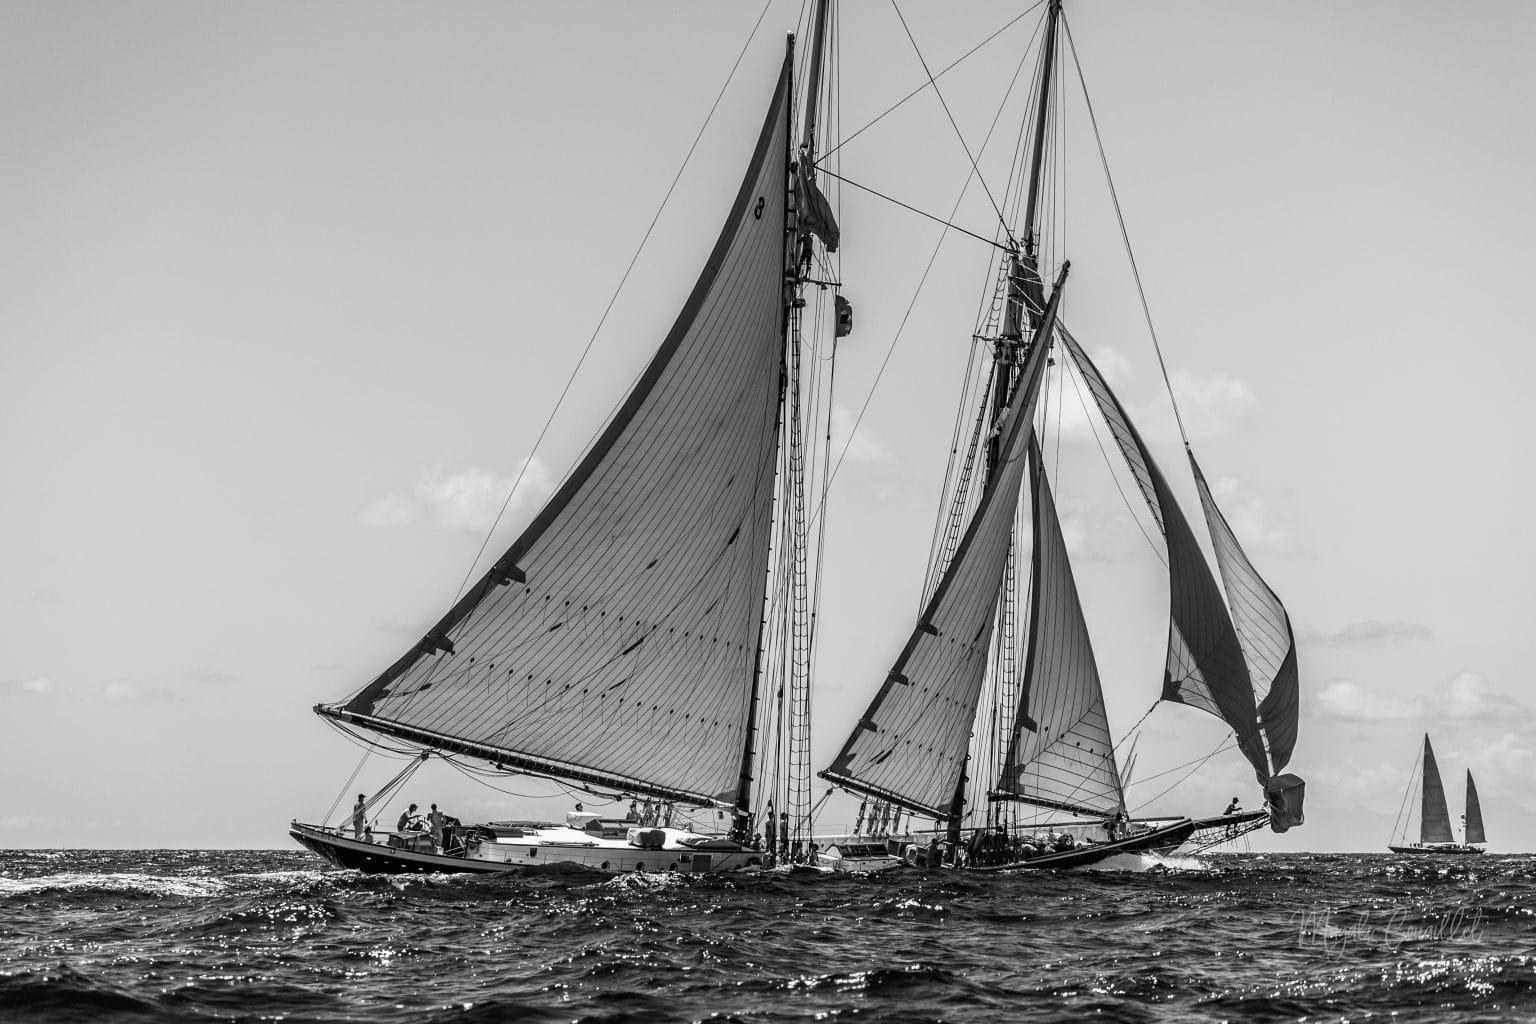 Columbia yacht, Bucket Regatta 2019 St Barths-2